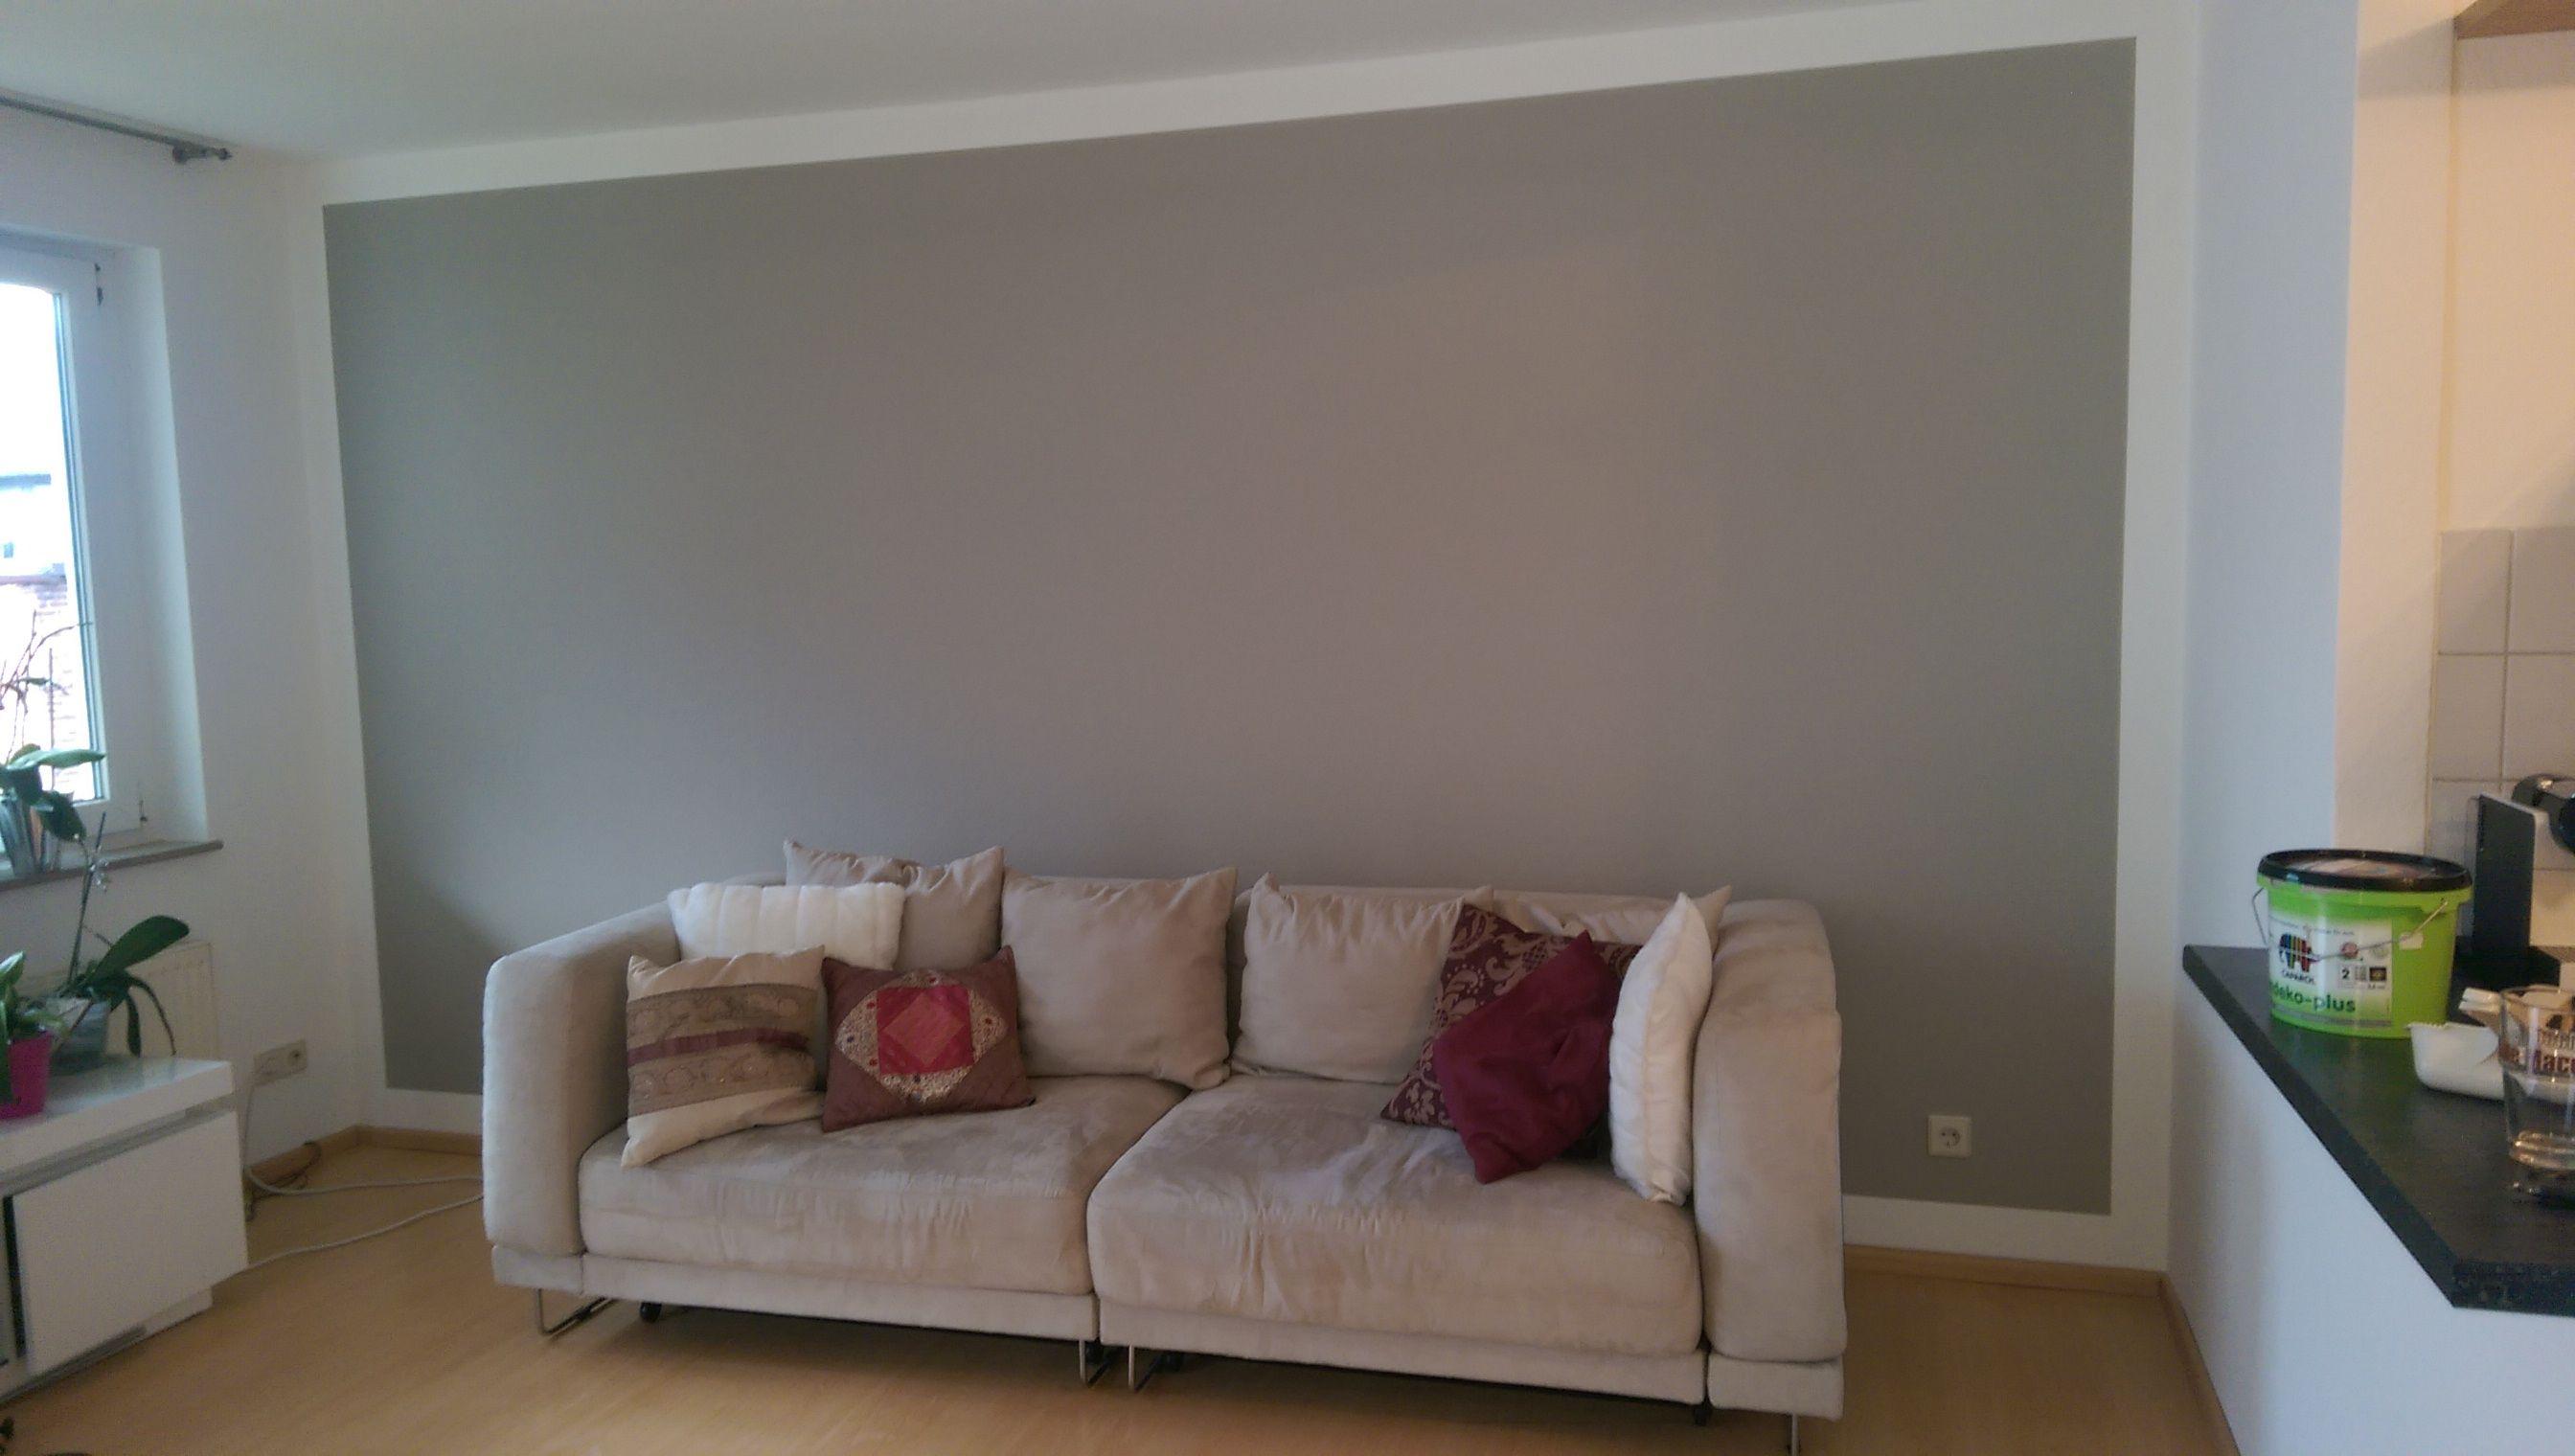 Farbige Wandgestaltung Ideen [droidsure.com]